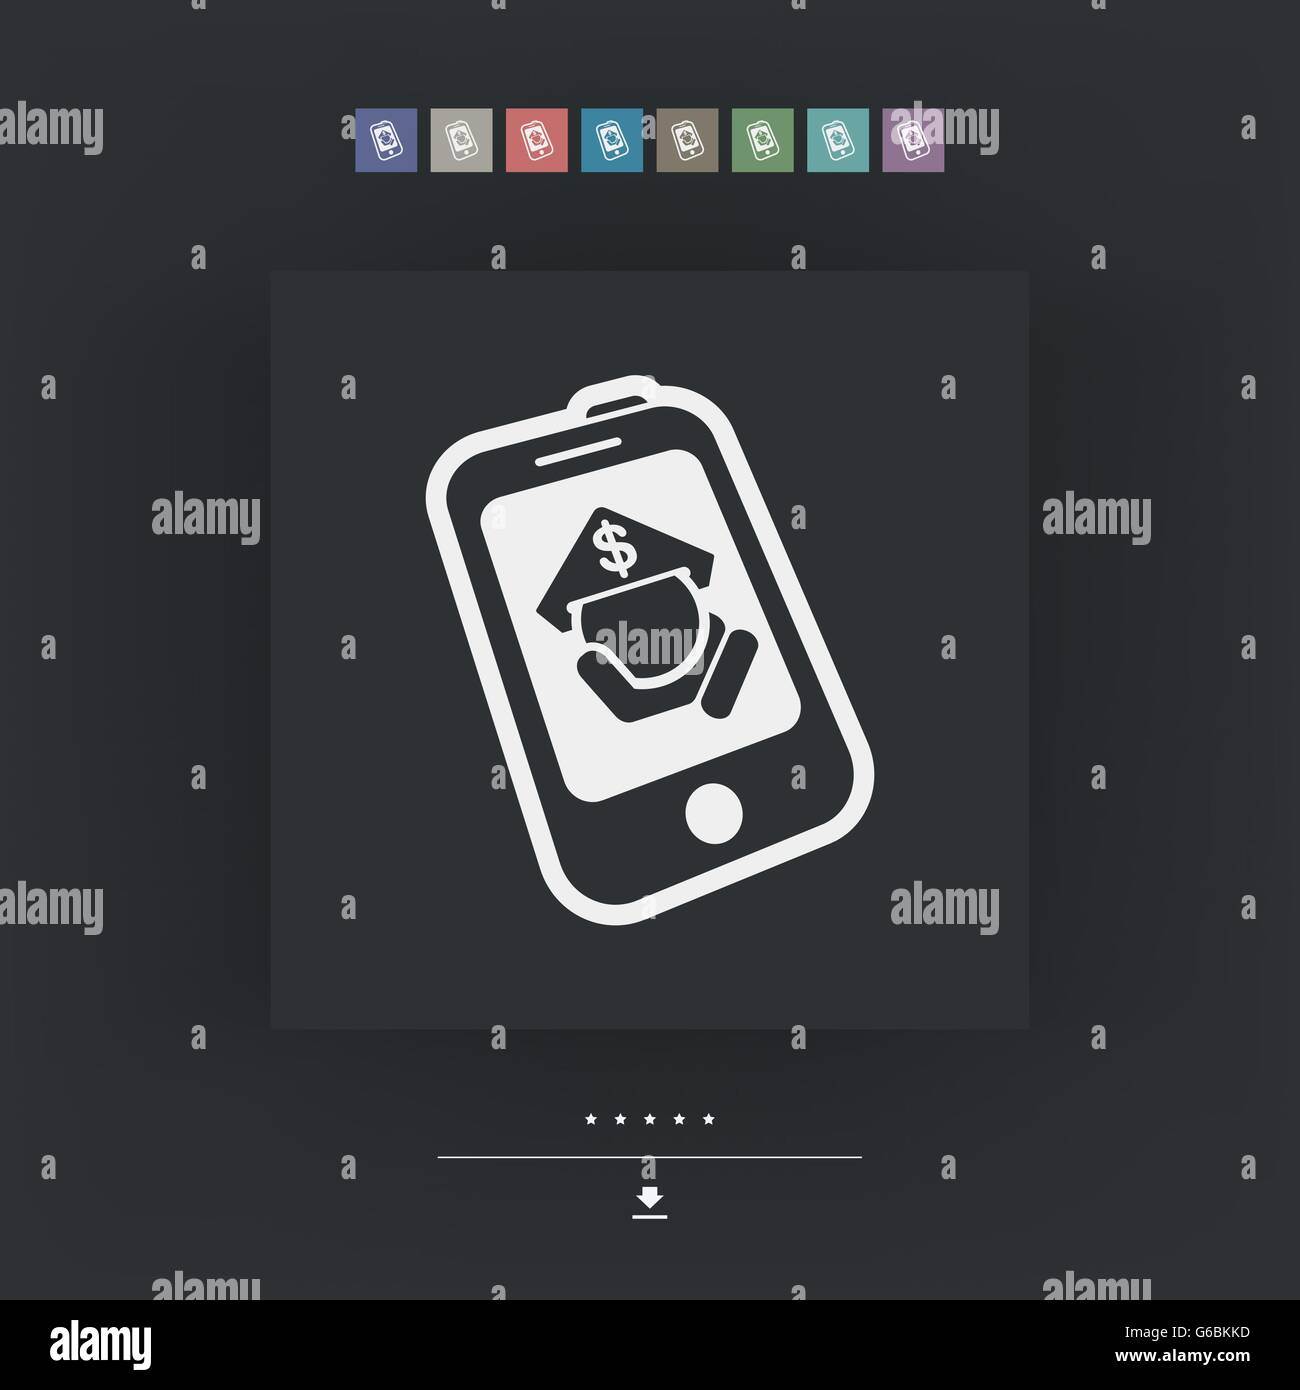 Phone Tariff Plan Stock Vector Art Illustration Vector Image